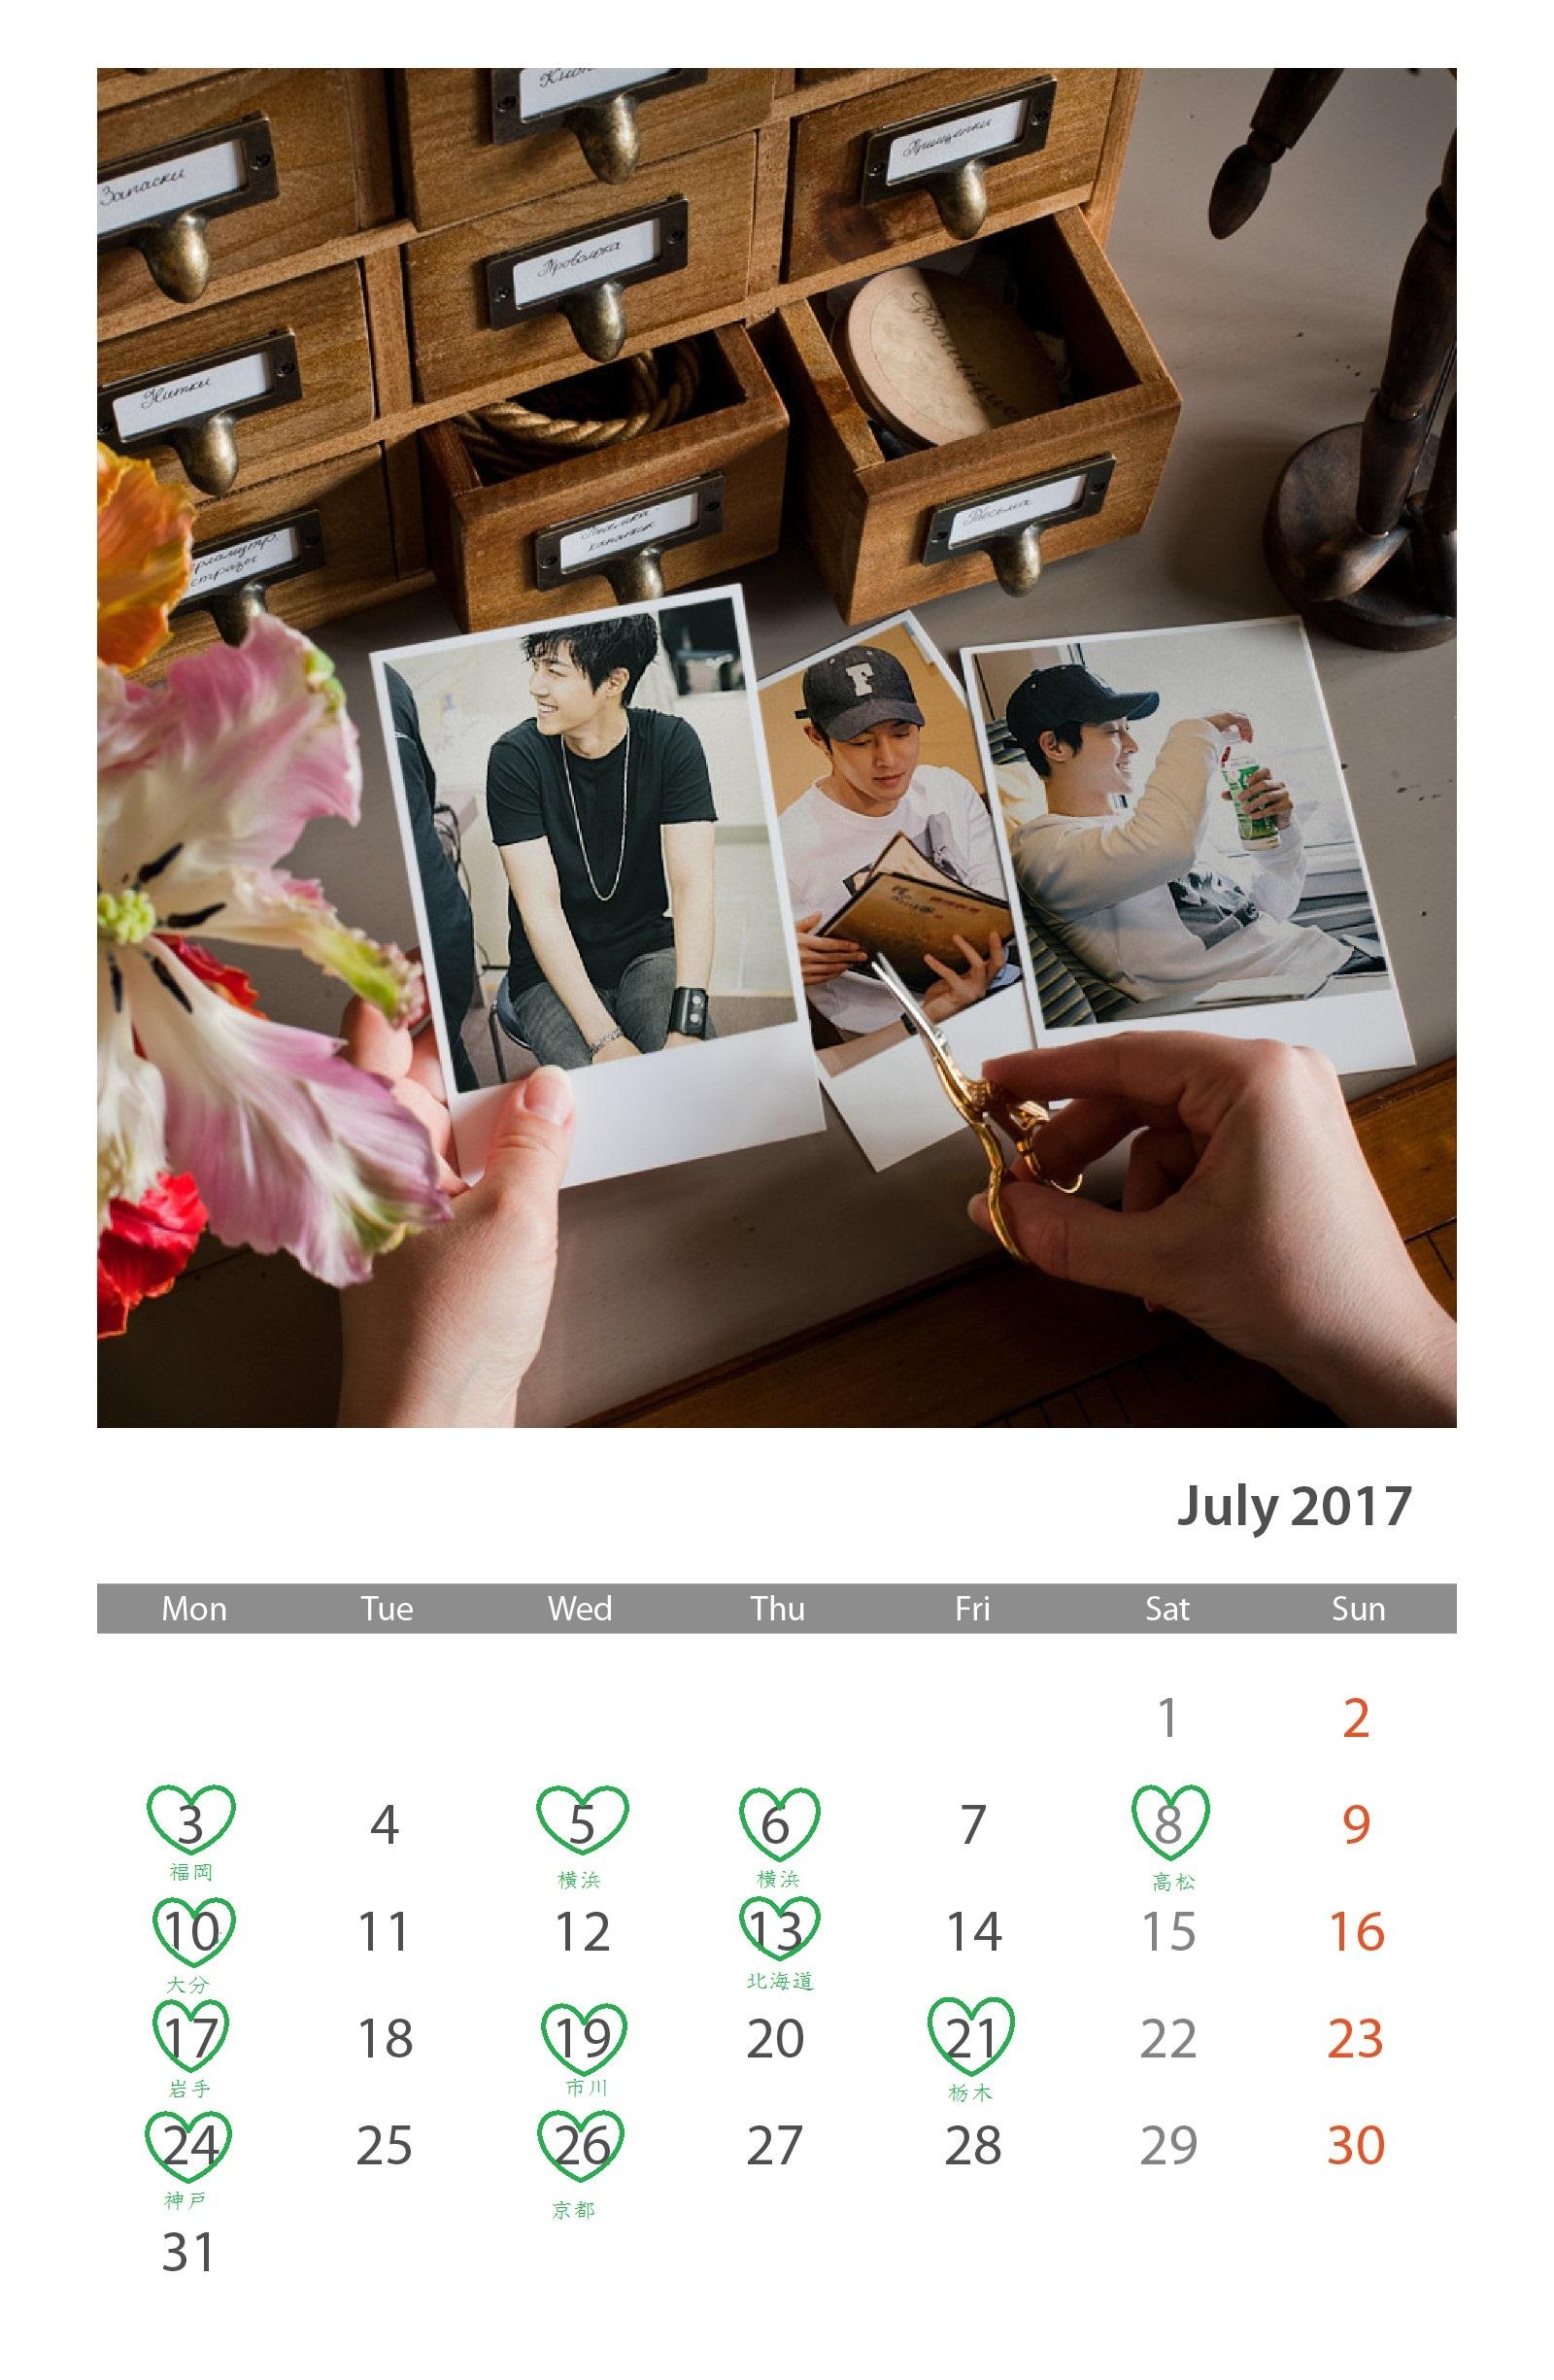 Calendar of July 2017 - 2017.07.01